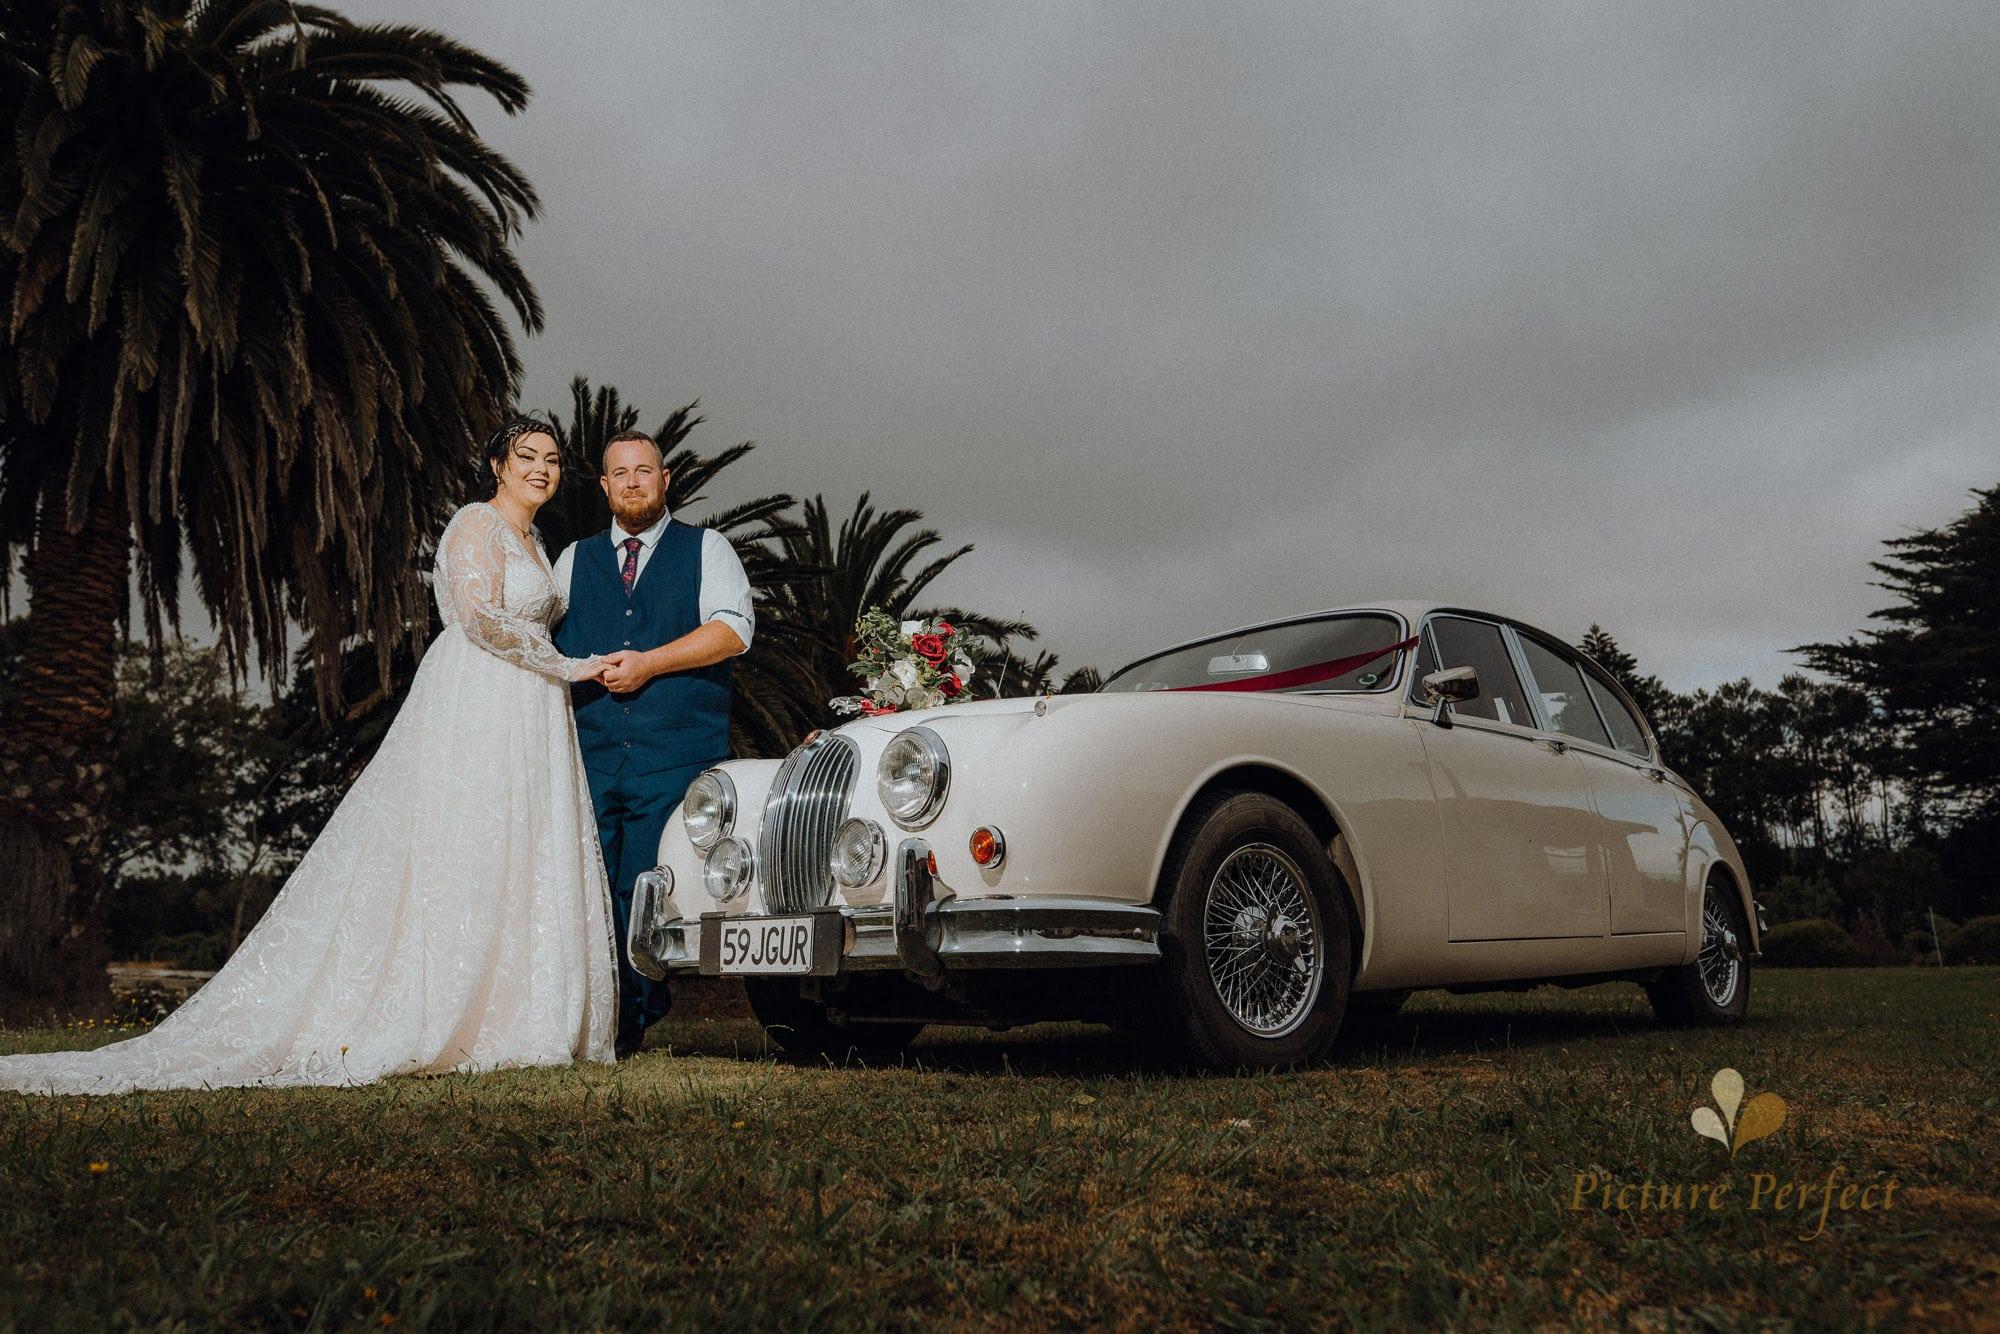 Sjaan wedding photos 2853